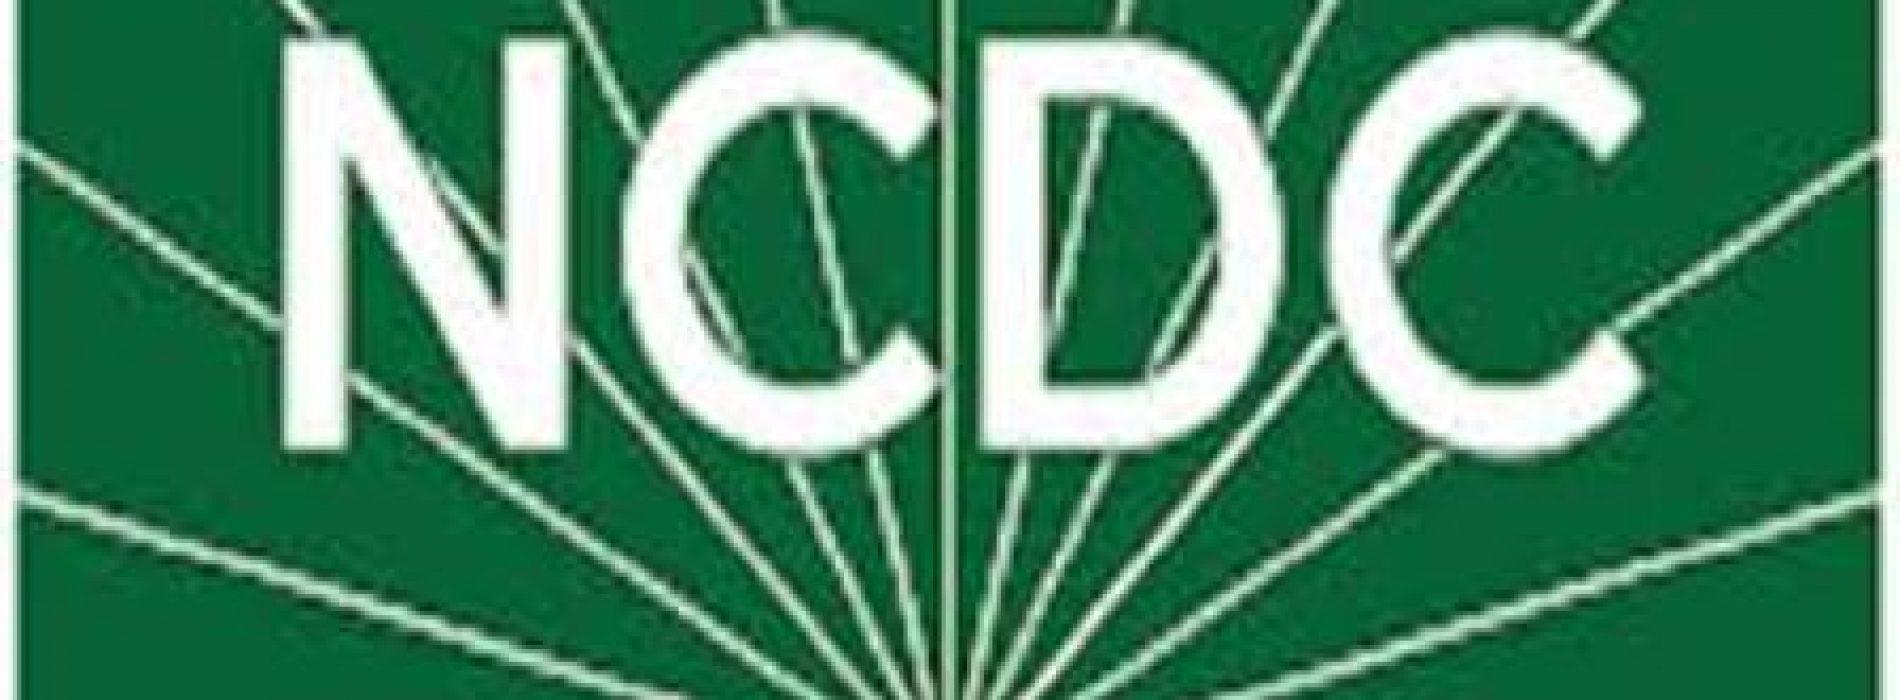 NCDC issues Public Health Advisory  on Ebola